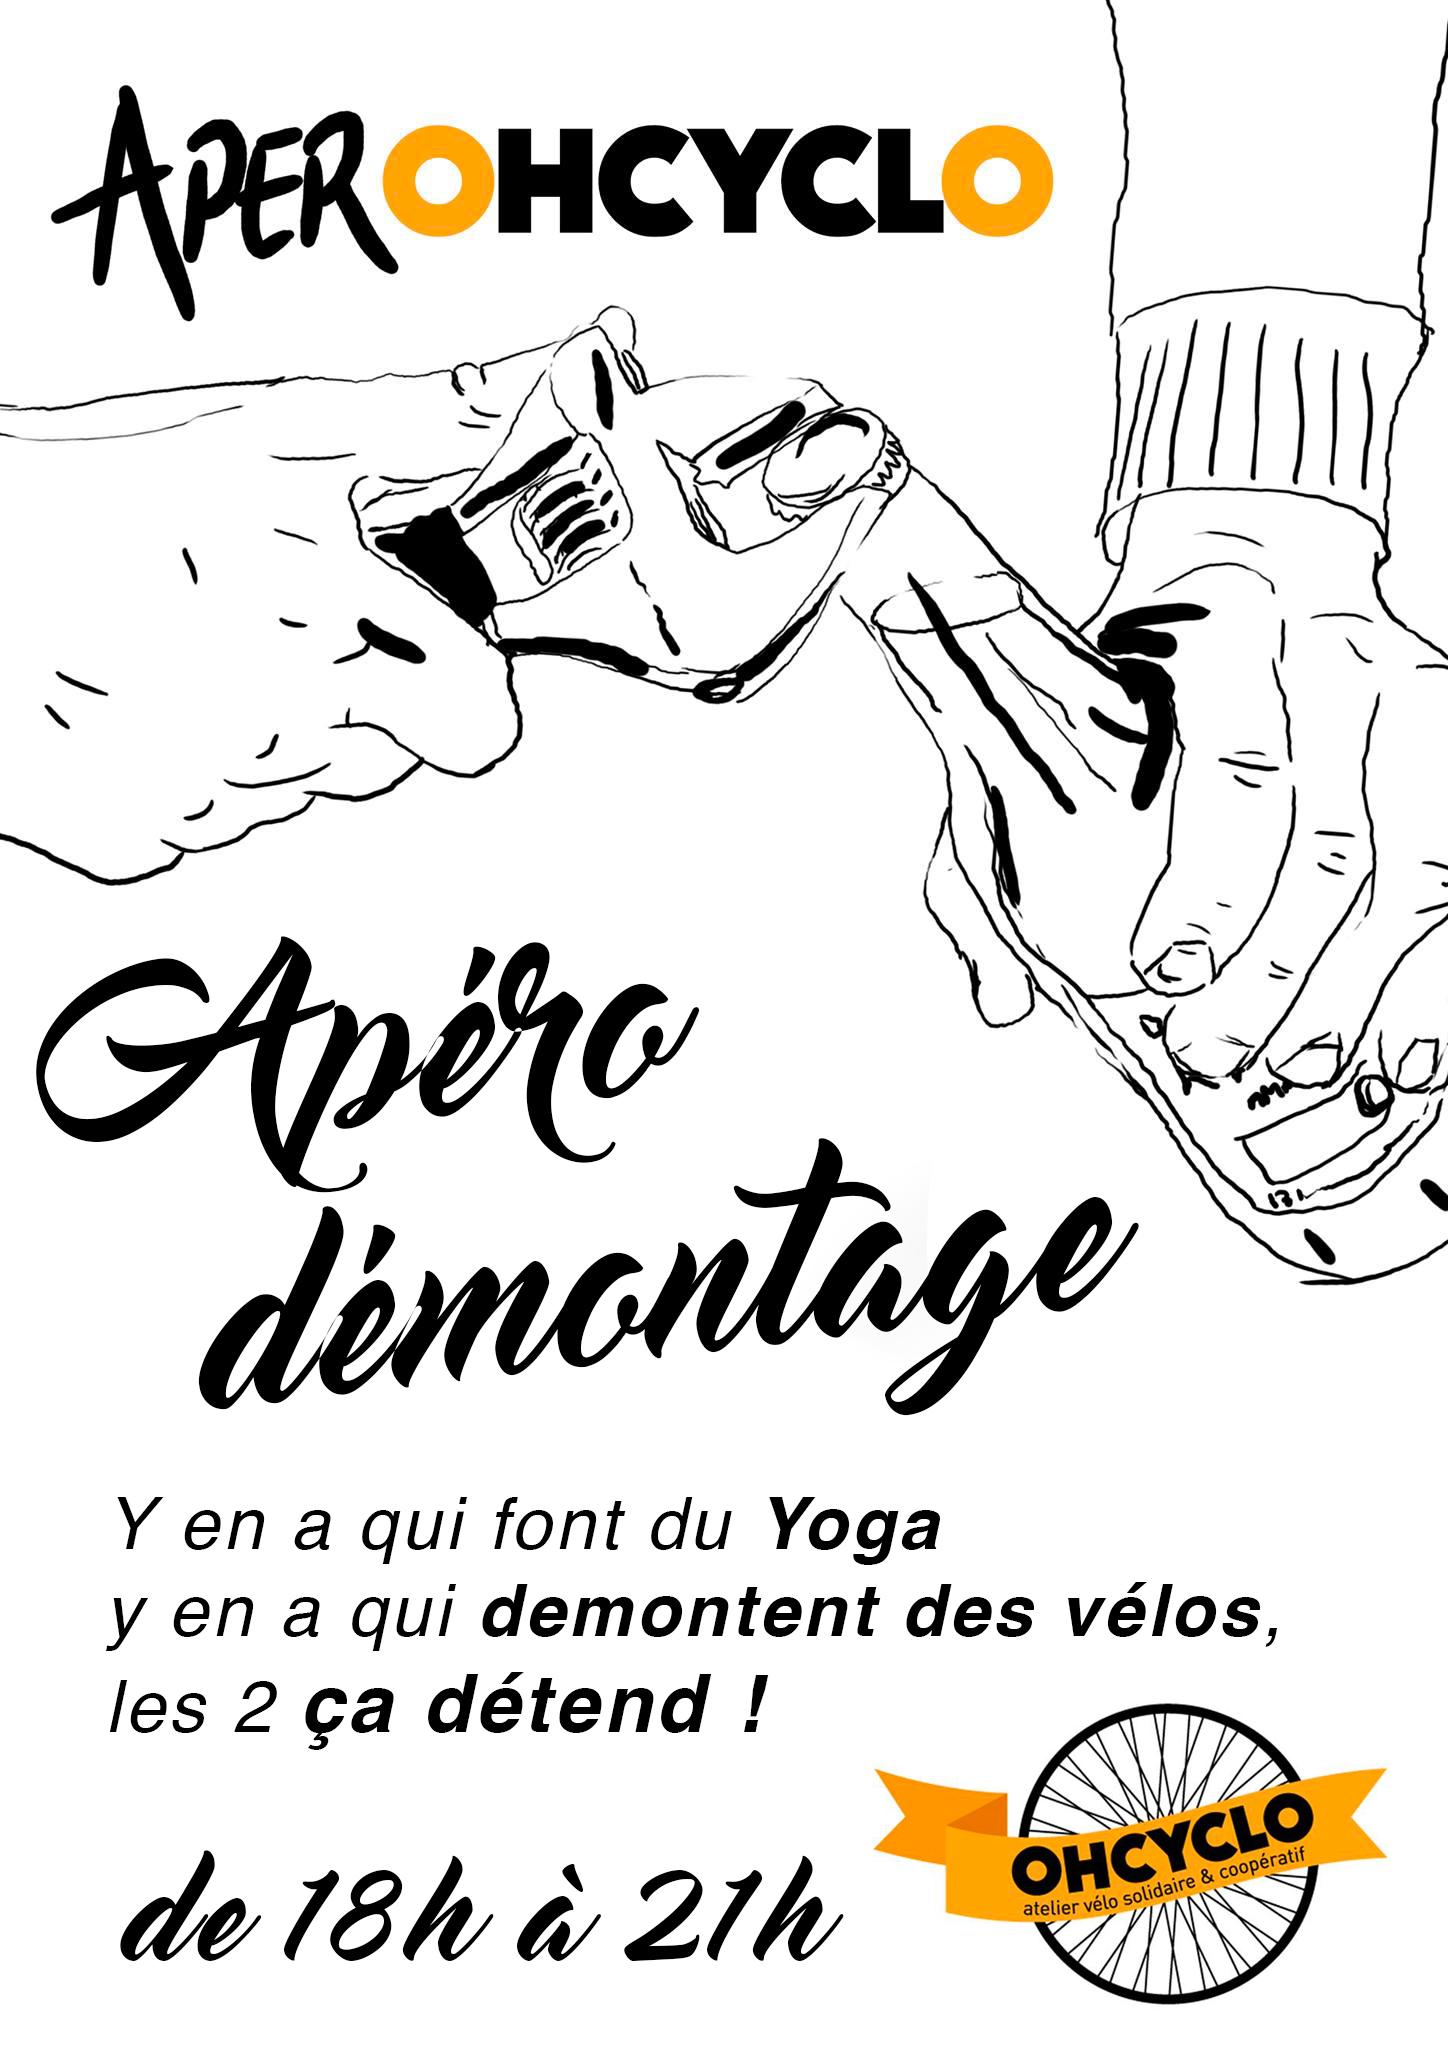 Soirée démontage @ OHCYCLO